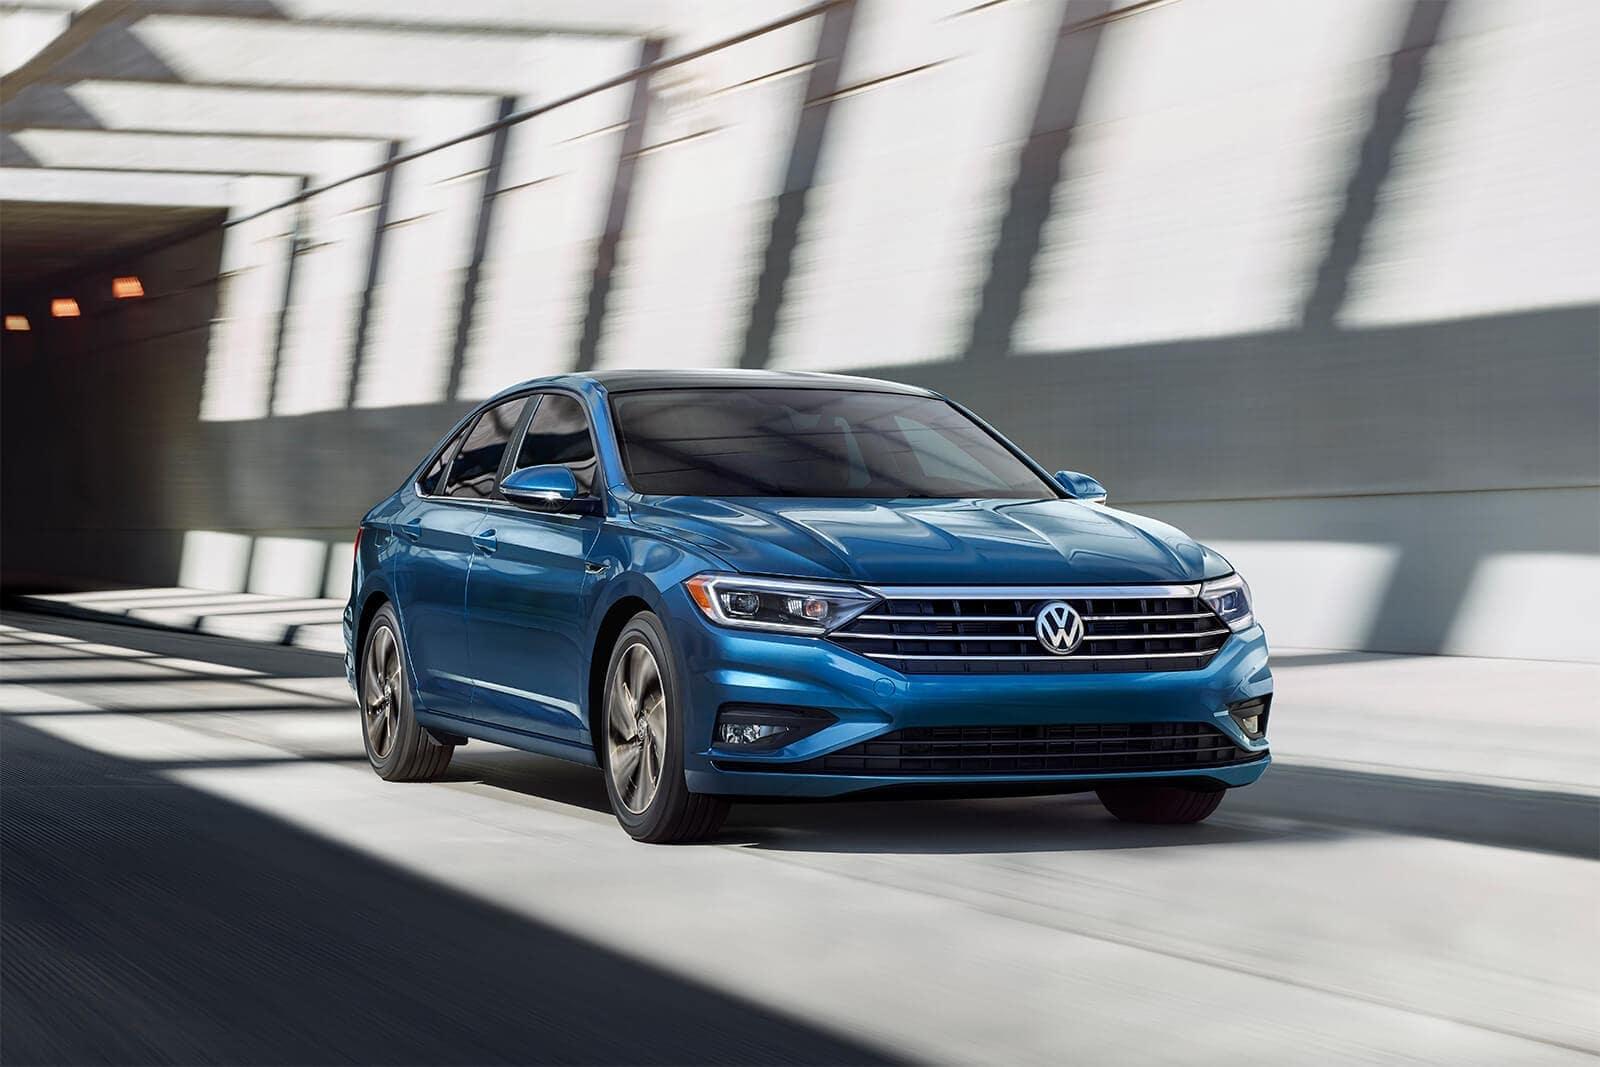 2019 Volkswagen Jetta in Silk Blue Metallic Driving on Road